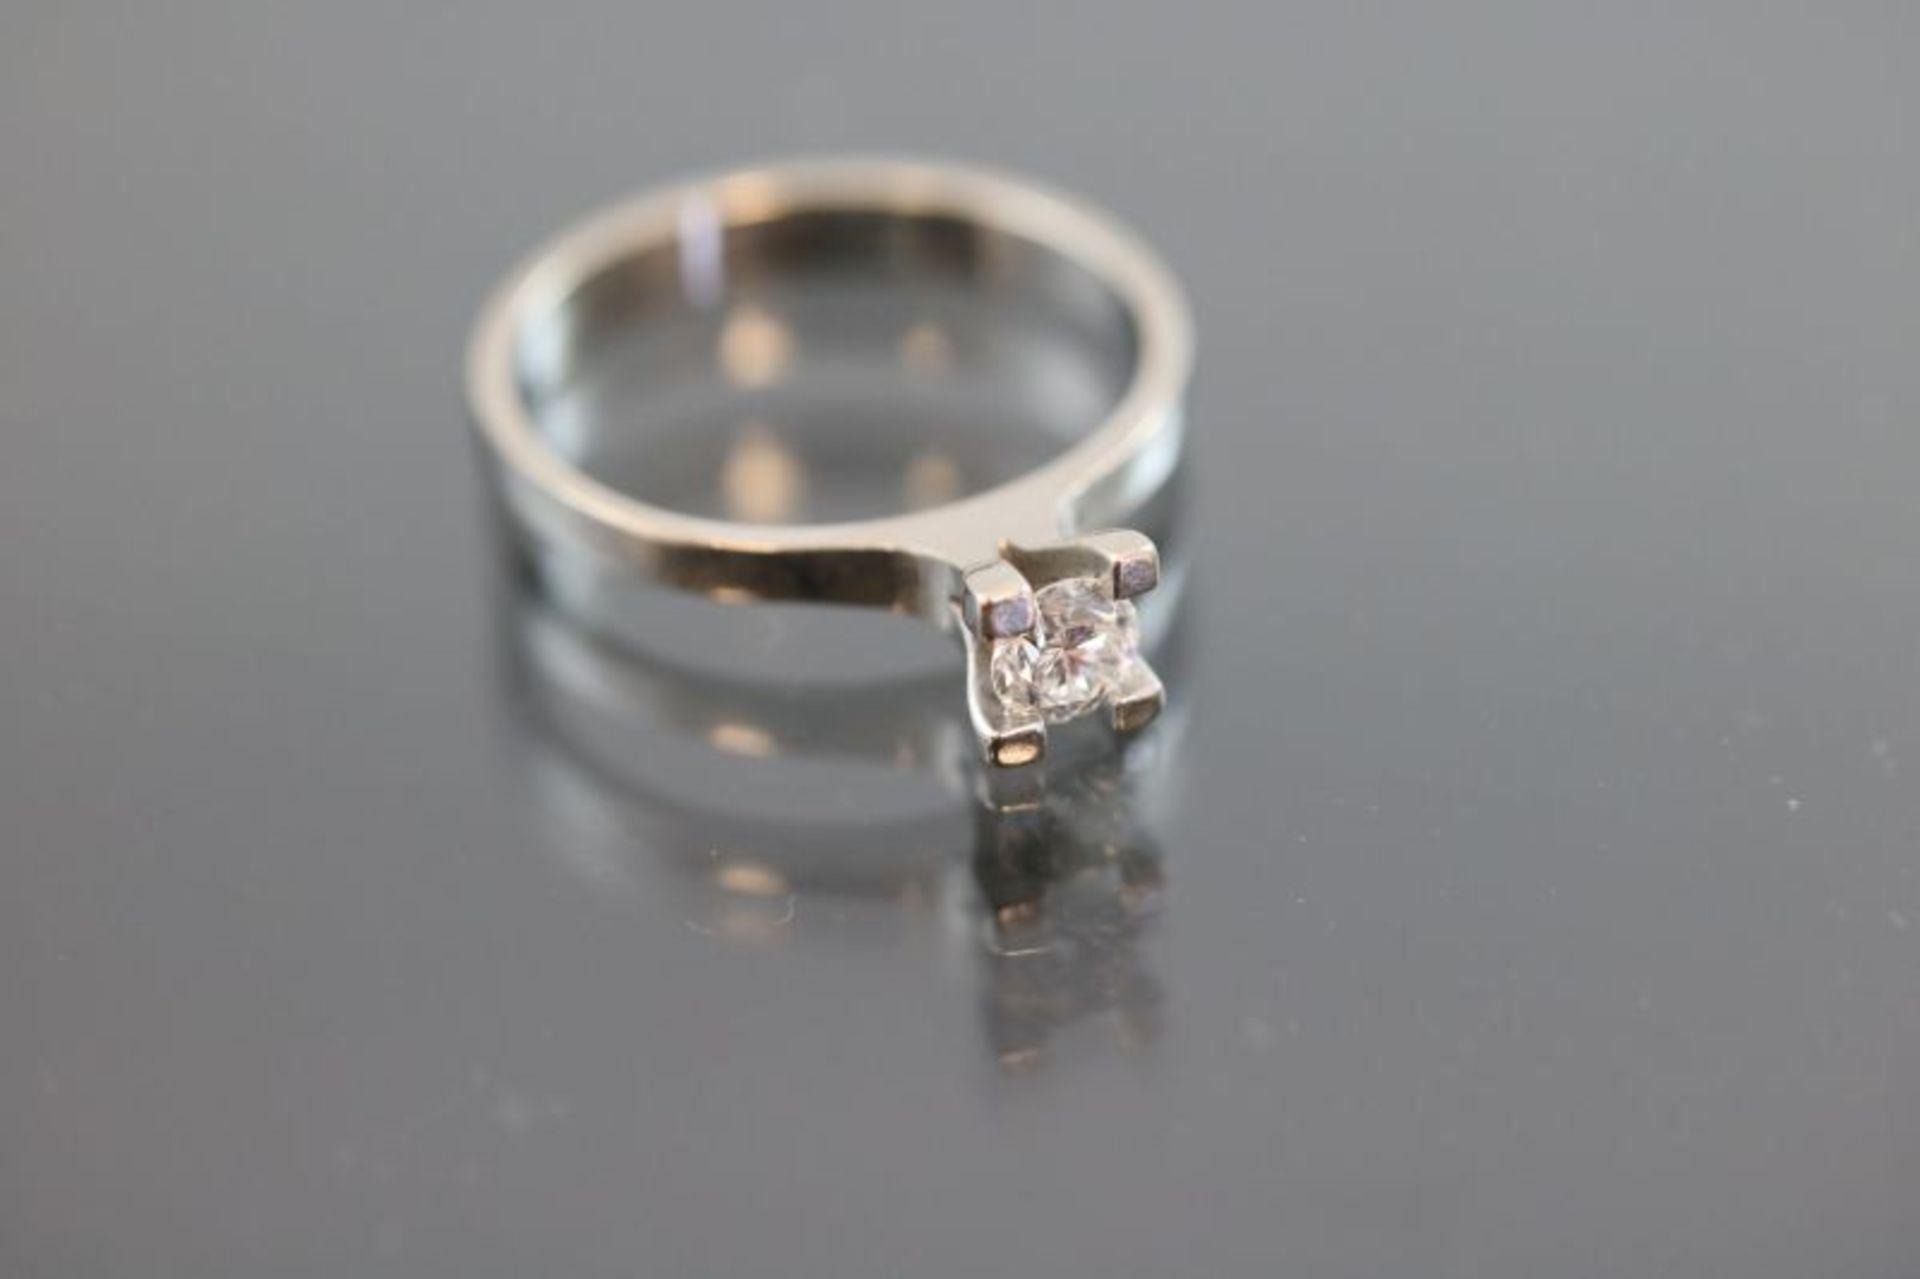 Los 20 - Brillant-Ring, 750 Weißgold2,62 Gramm 1 Brillant, 0,20 ct., w/si. Ringgröße: 52